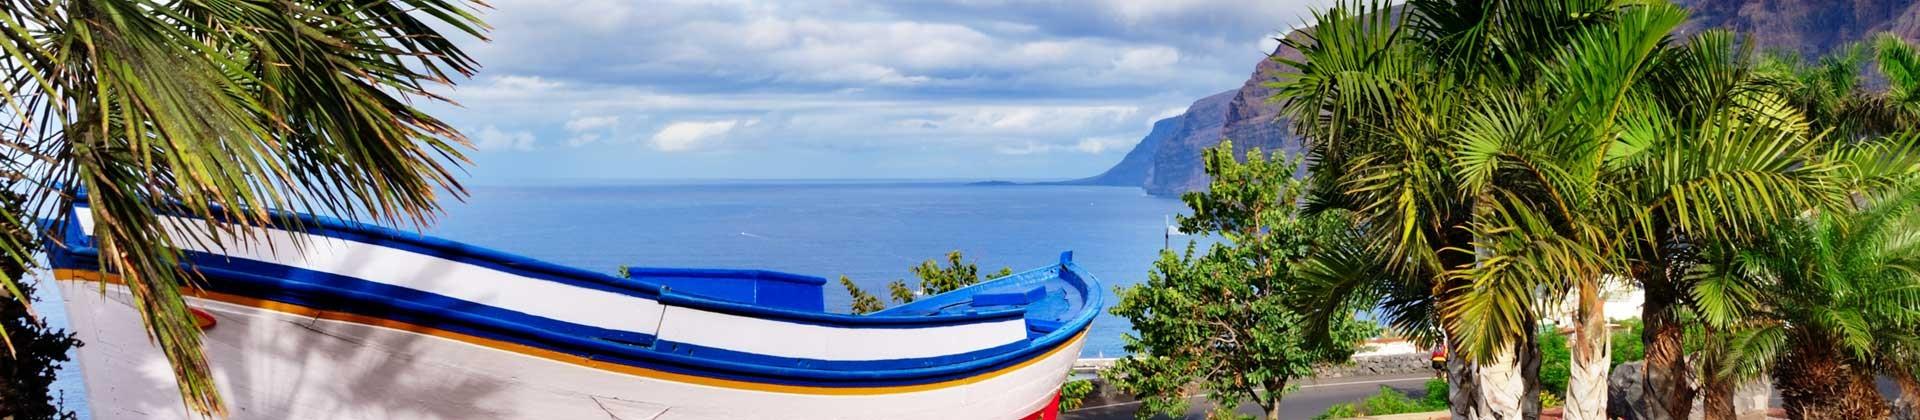 https://www.goodmorningtenerife.com/wp-content/uploads/2014/08/02_slide_los_gigantes_GM_Tenerife-1920x420.jpg